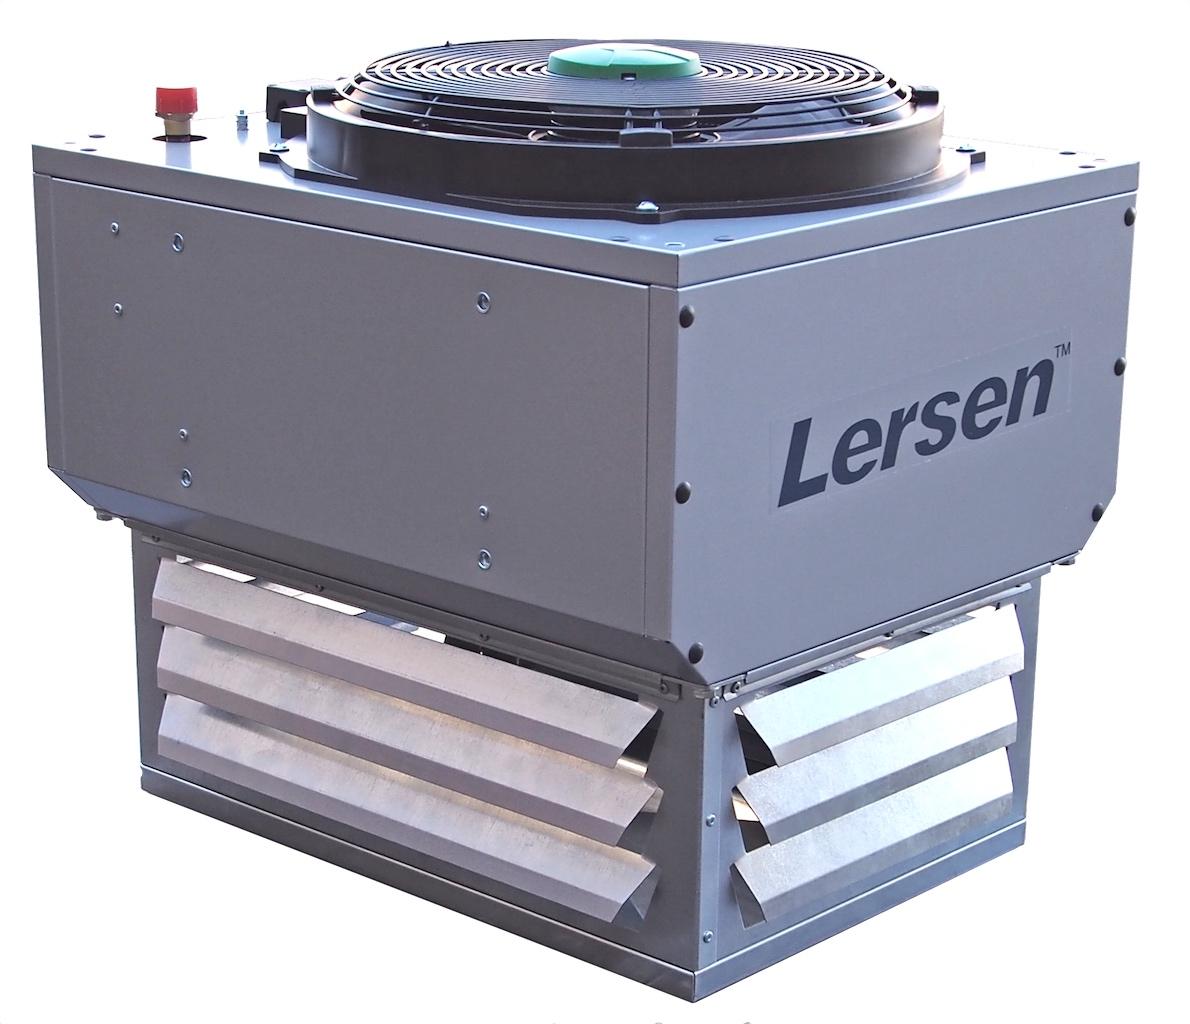 Lersen ZETA TOP